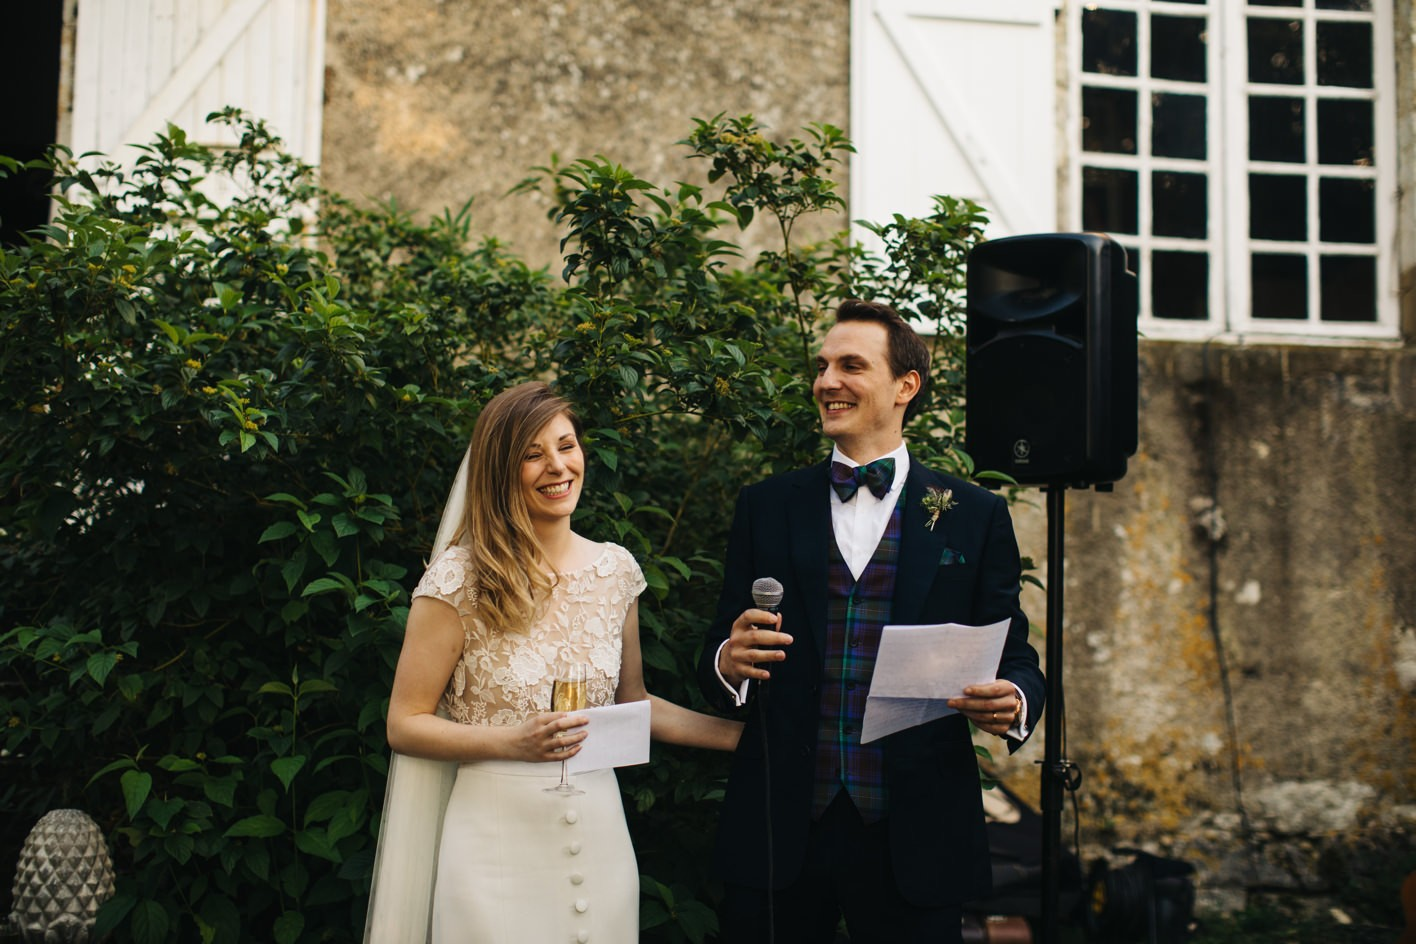 bride and groom make speech together